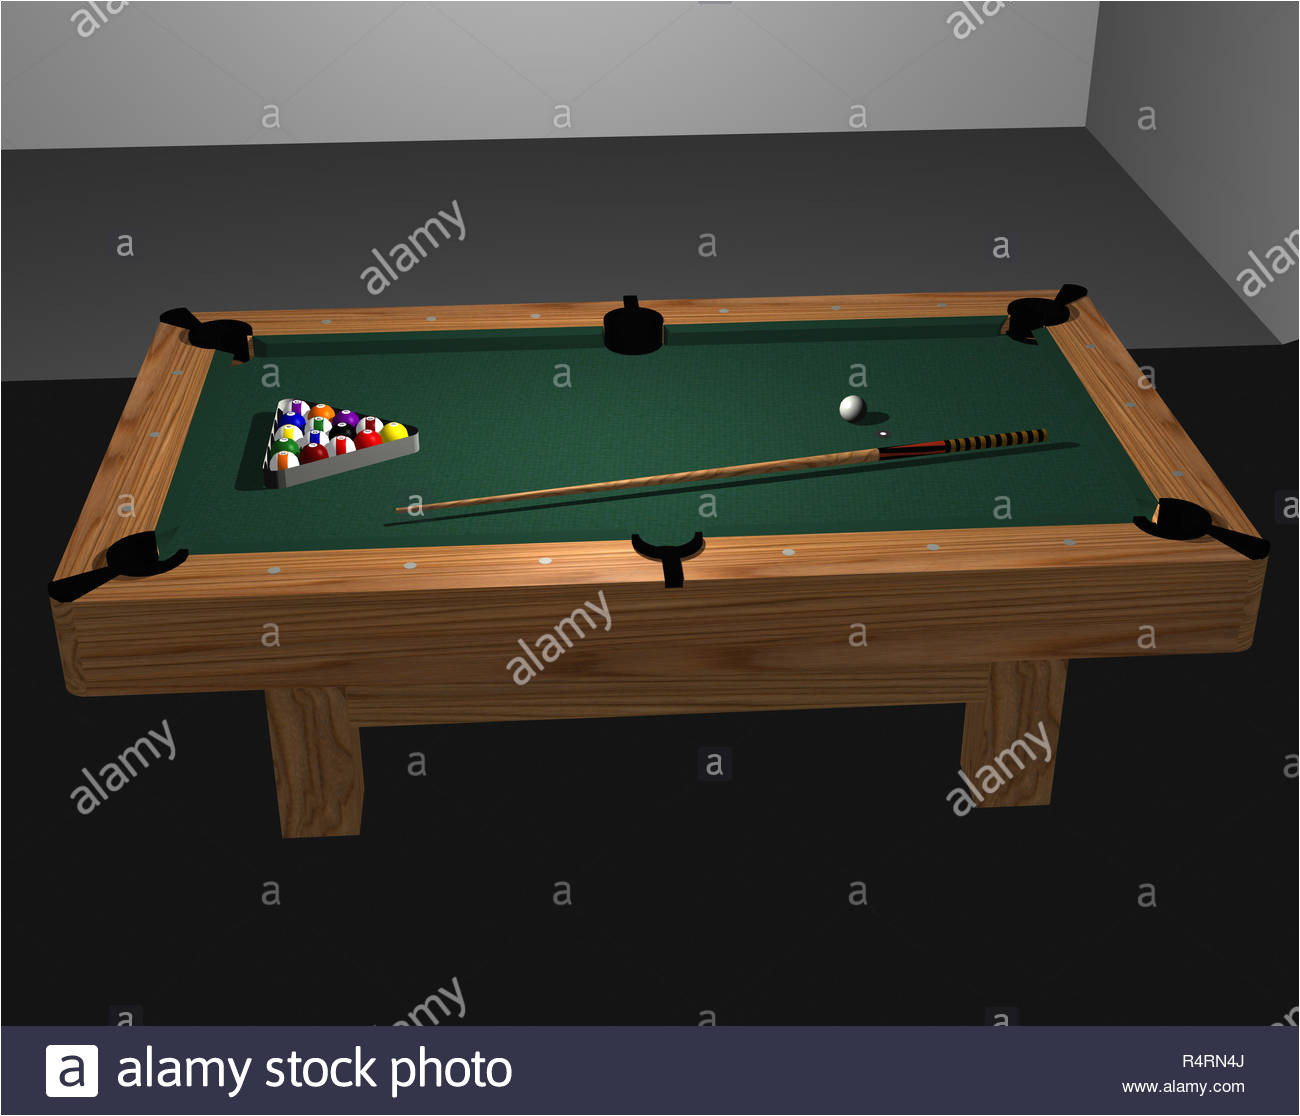 billiard table free stock image